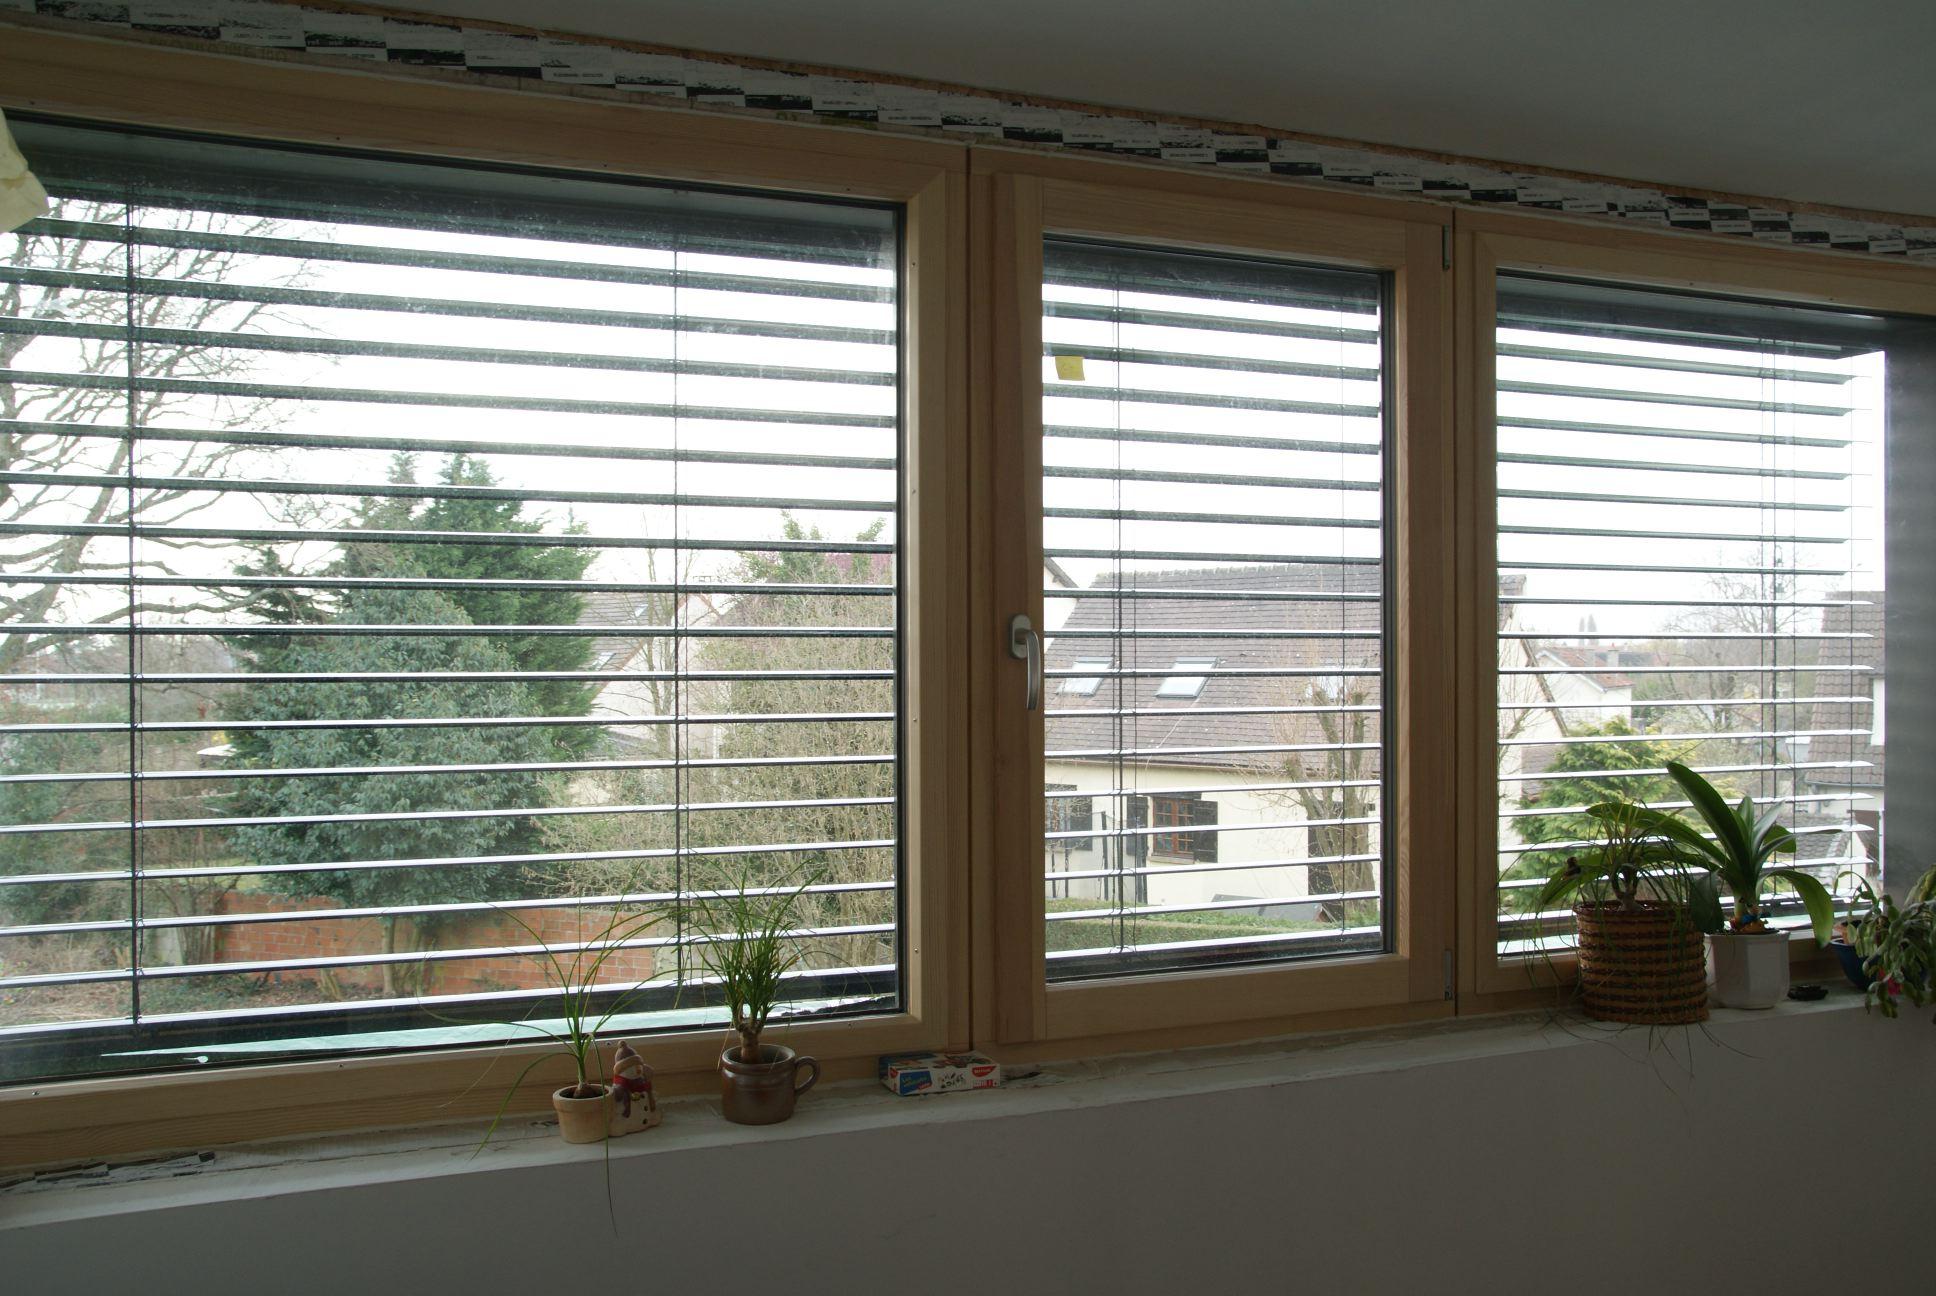 pin brise soleil orientable vue int rieur store v nitien d. Black Bedroom Furniture Sets. Home Design Ideas